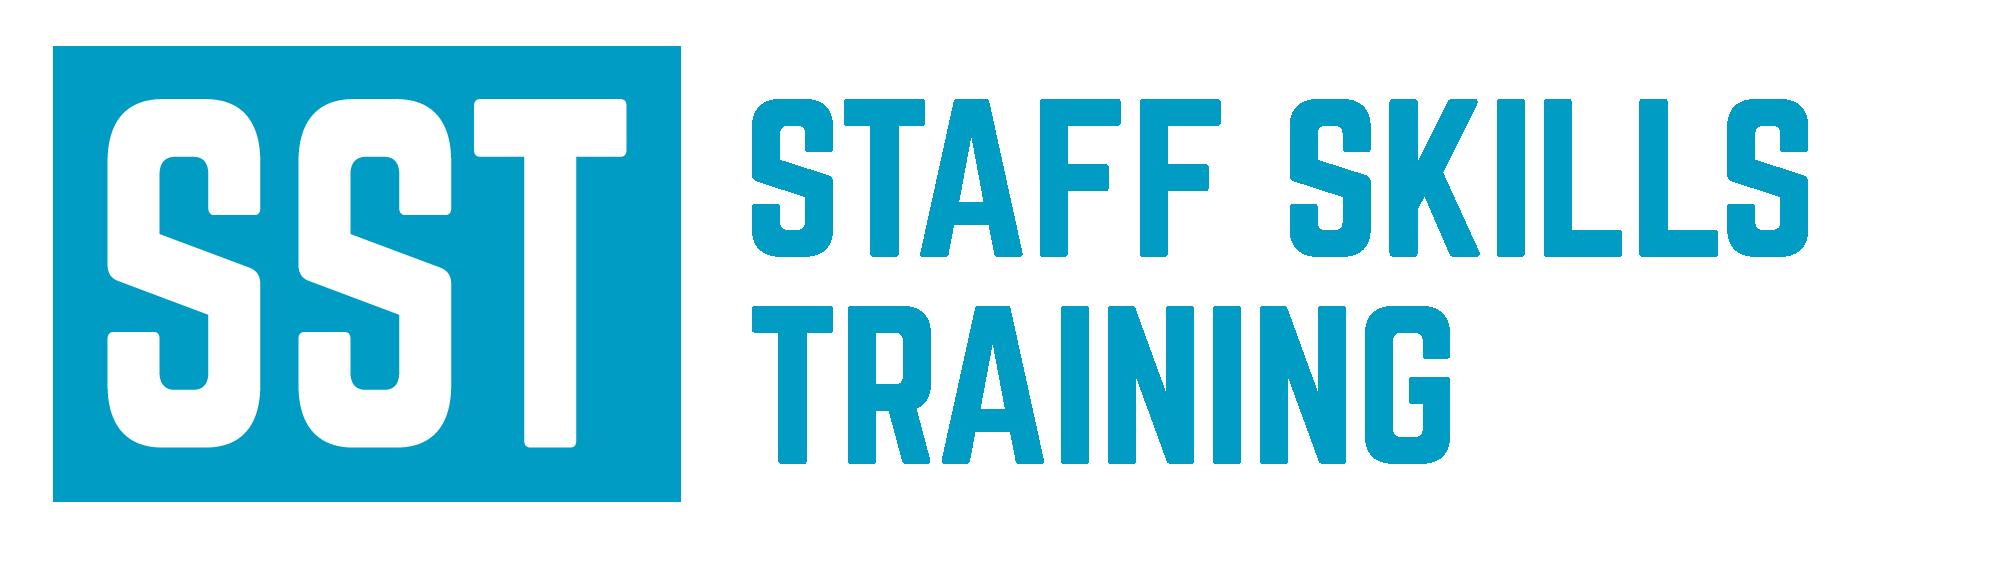 Staff Skills Academy